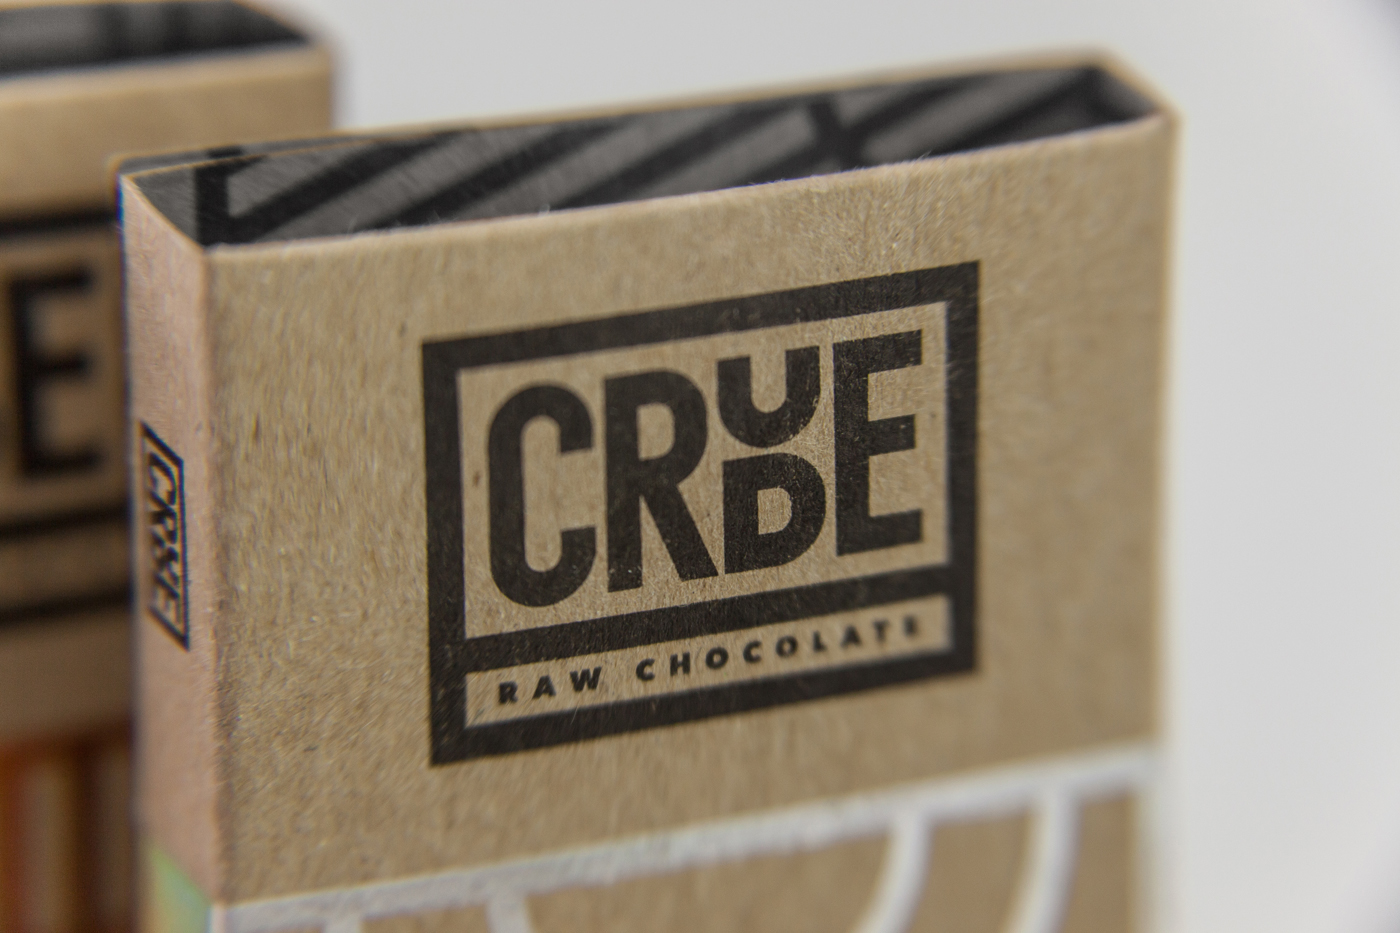 CRUDE Raw Chocolate